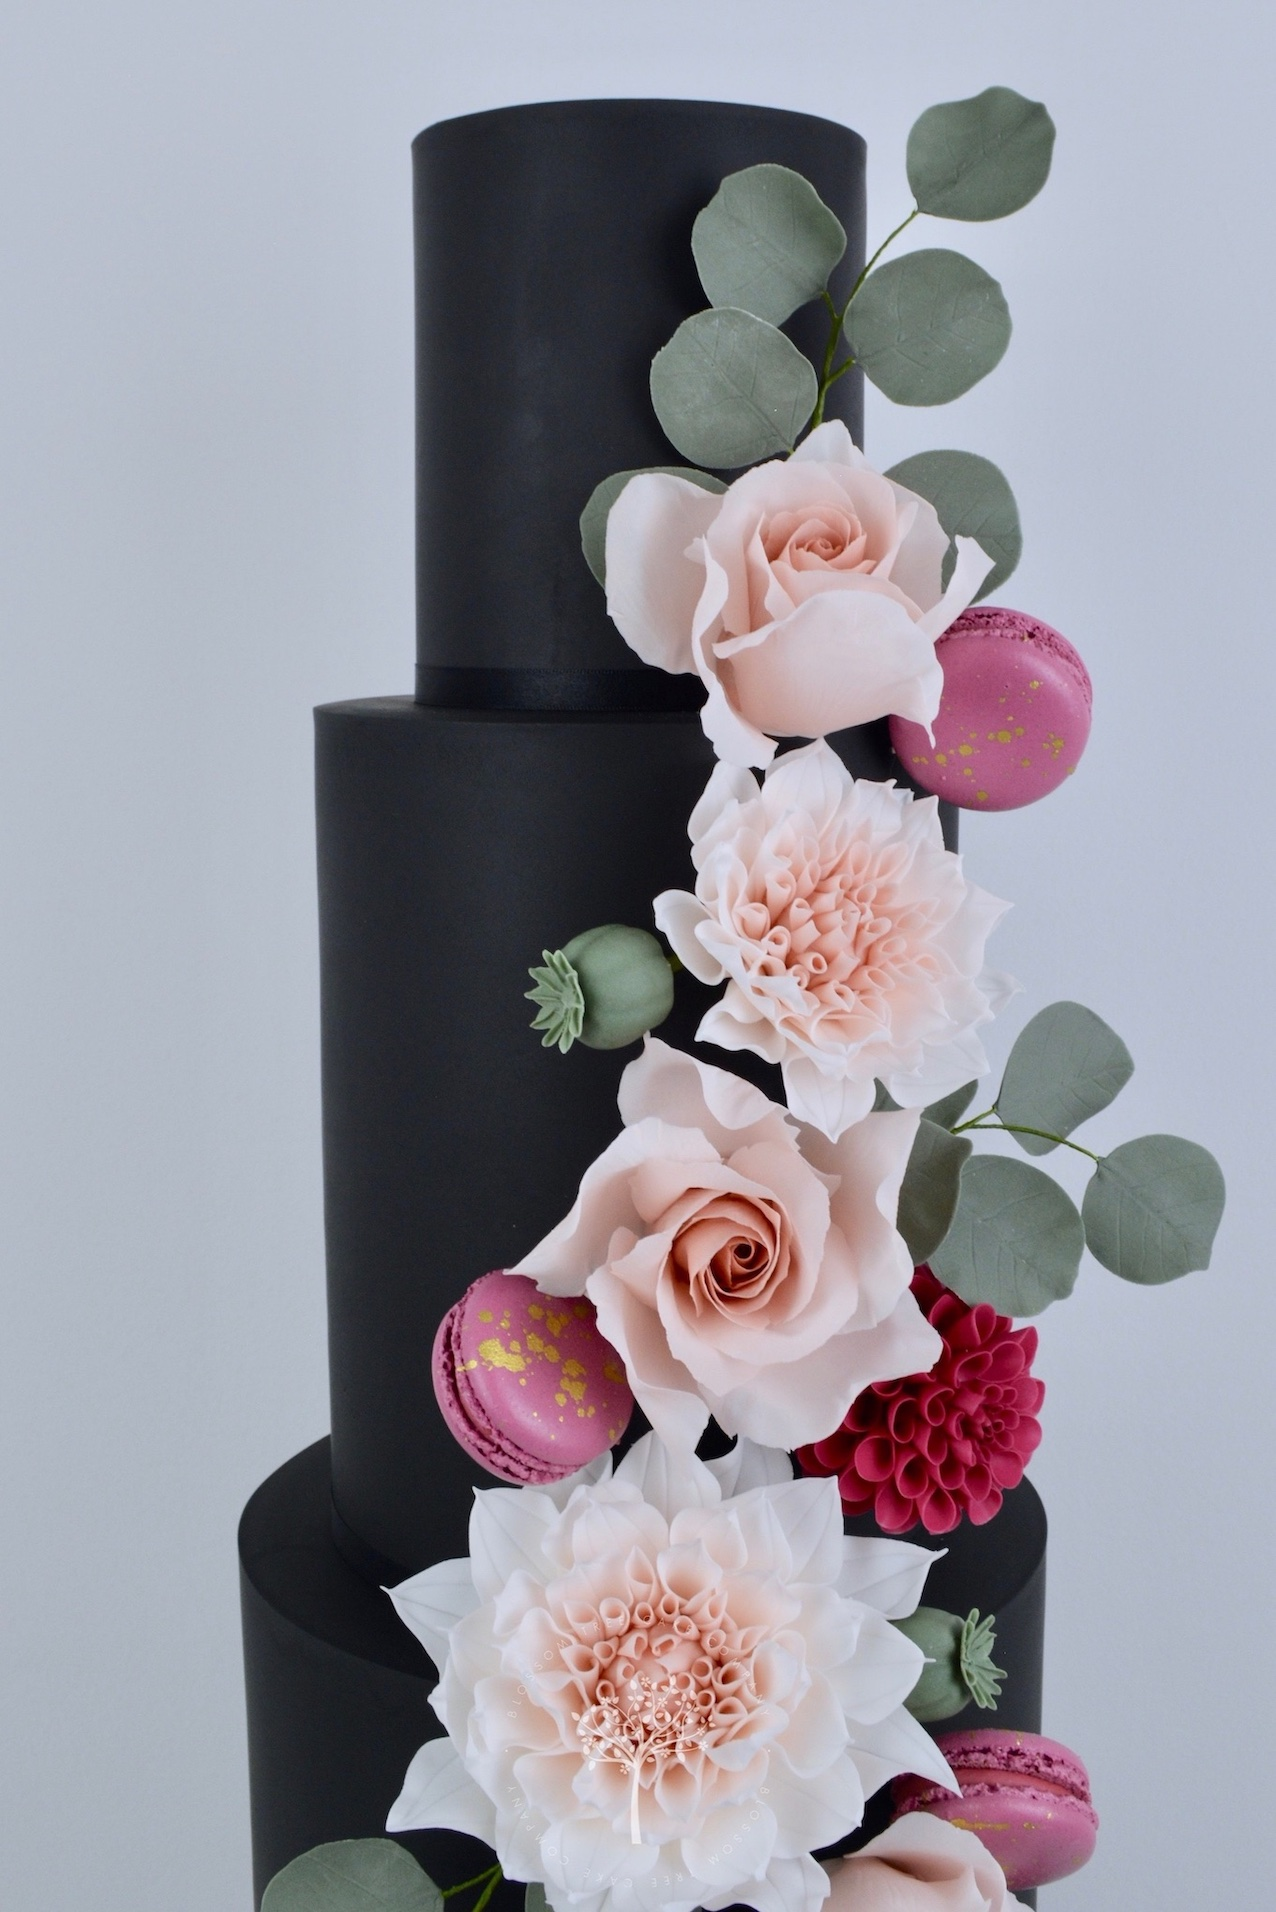 Dahlia & Black wedding cake by Blossom Tree Cake Company Harrogate North Yorkshire - top sugar flowers.jpg